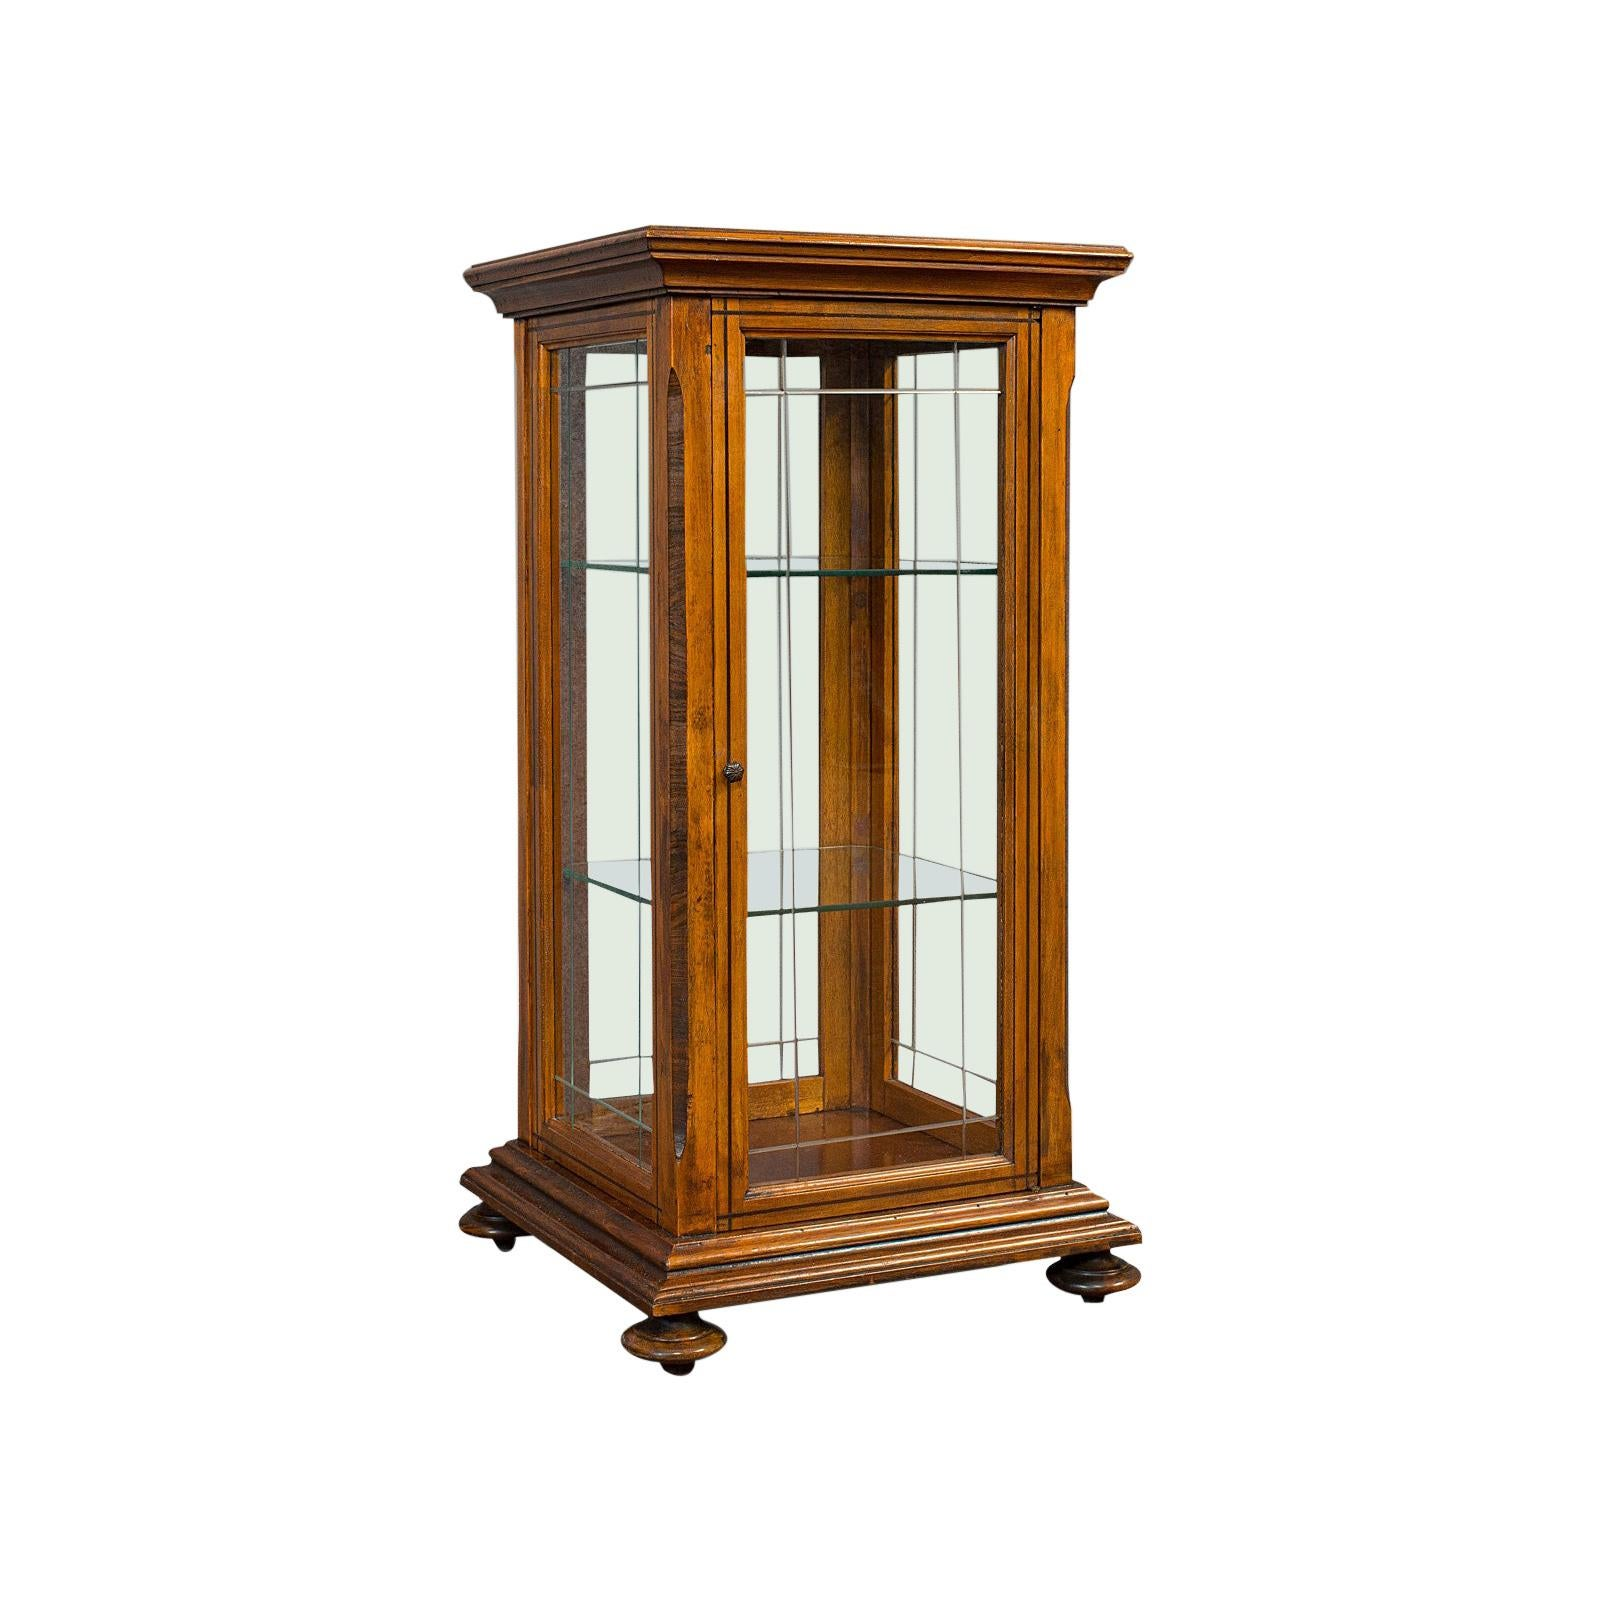 Antique Shop Display Cabinet, English, Oak, Walnut, Showcase, Edwardian